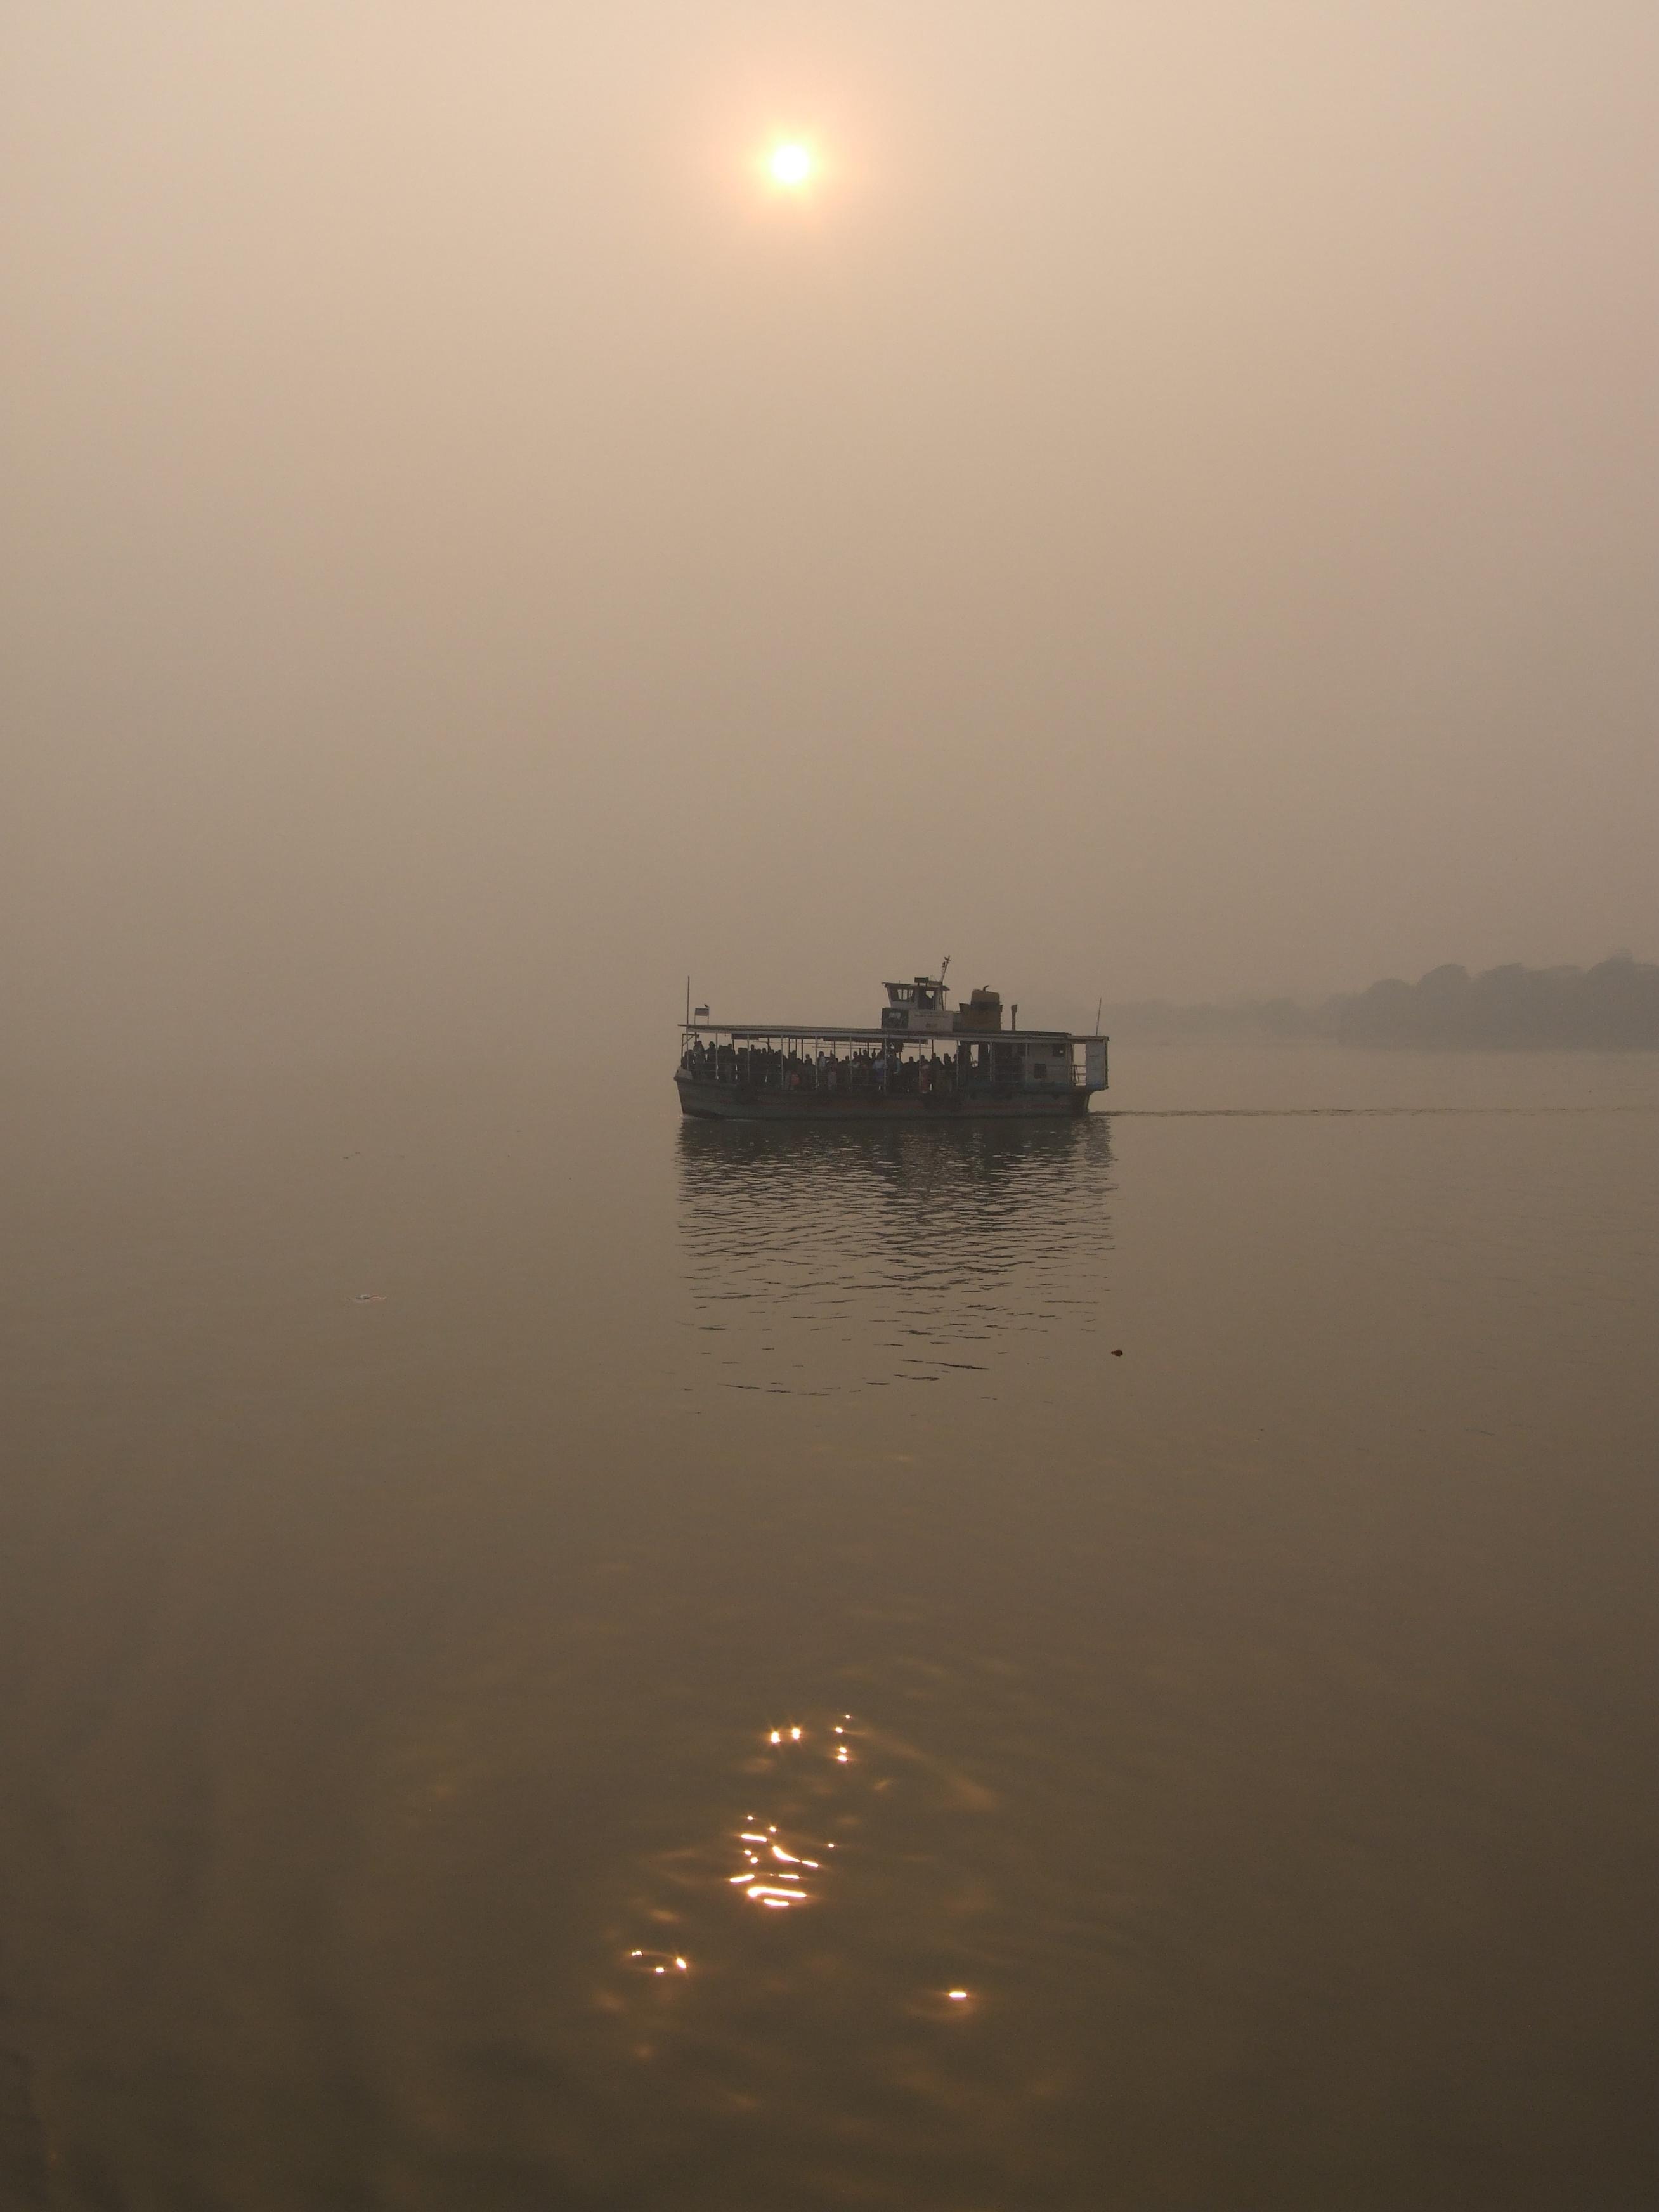 Ferry across the Brahmaputra